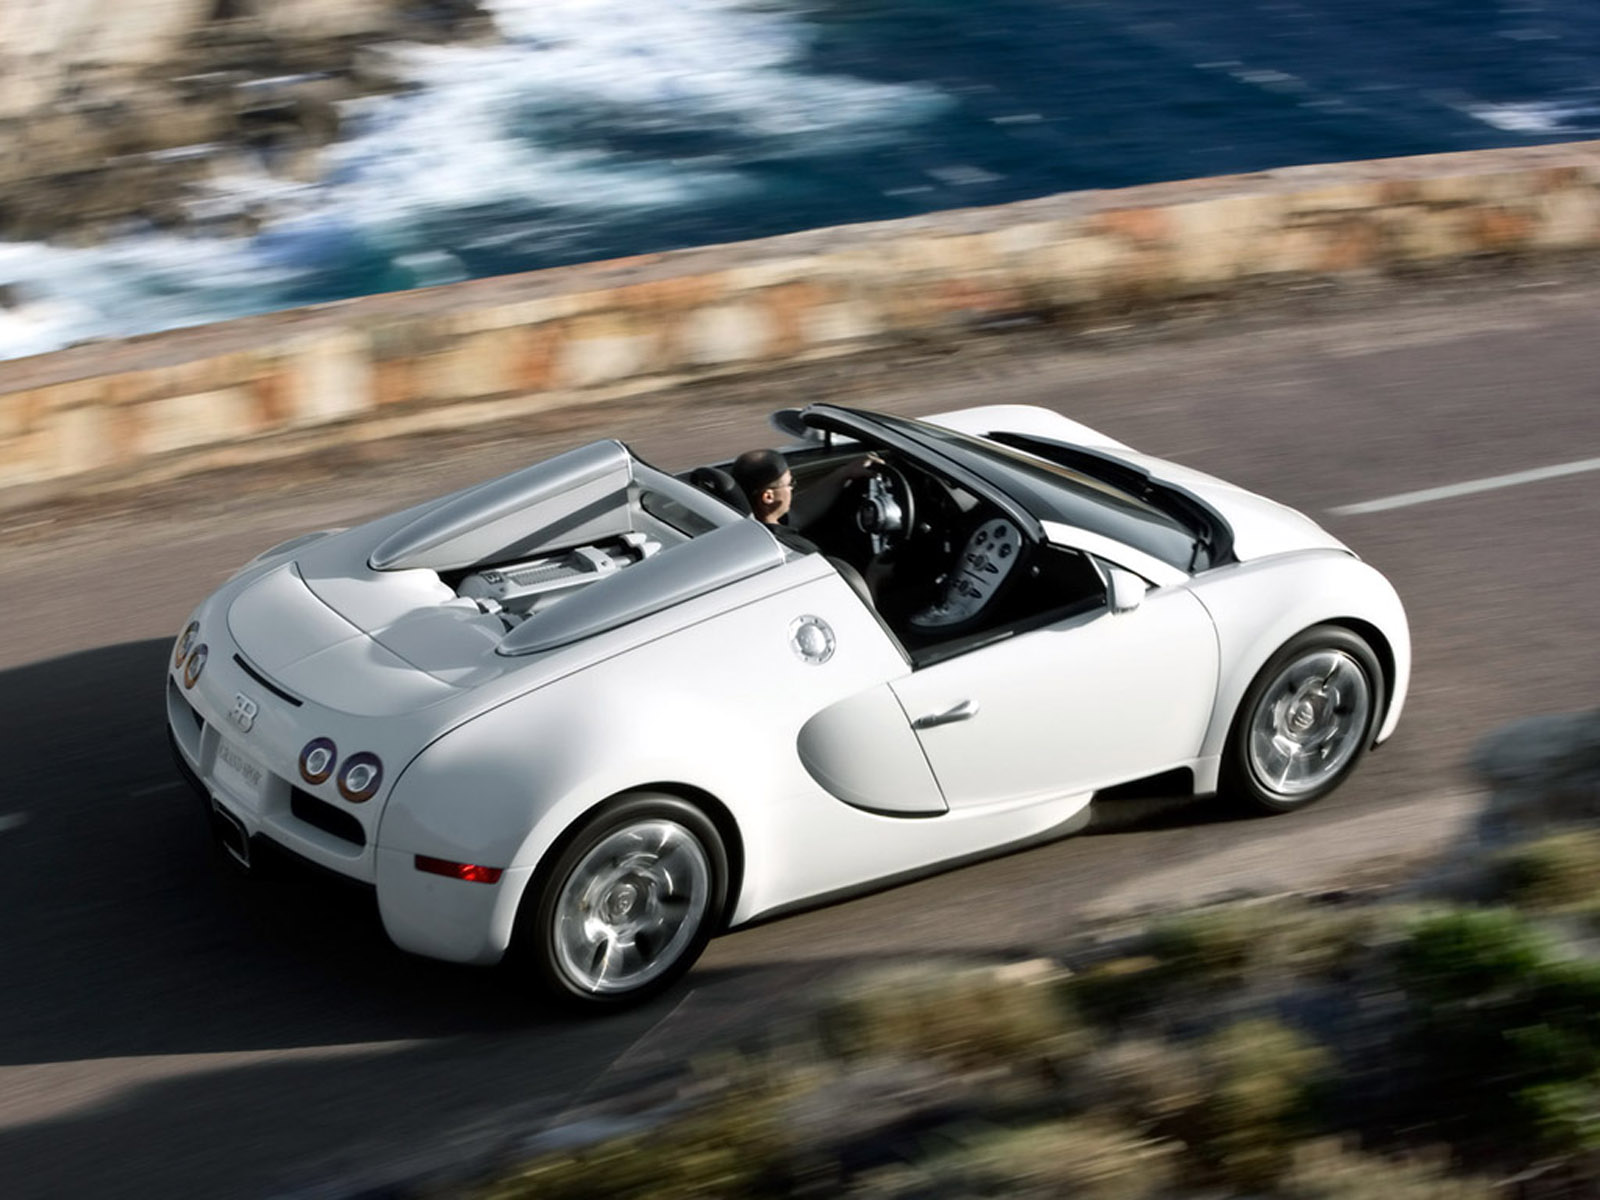 https://2.bp.blogspot.com/-P2qALplaptA/Tfg40lJhWeI/AAAAAAAABh8/y6AbgLAQST4/s1600/bugatti-164-veyron-grand-sport.jpg